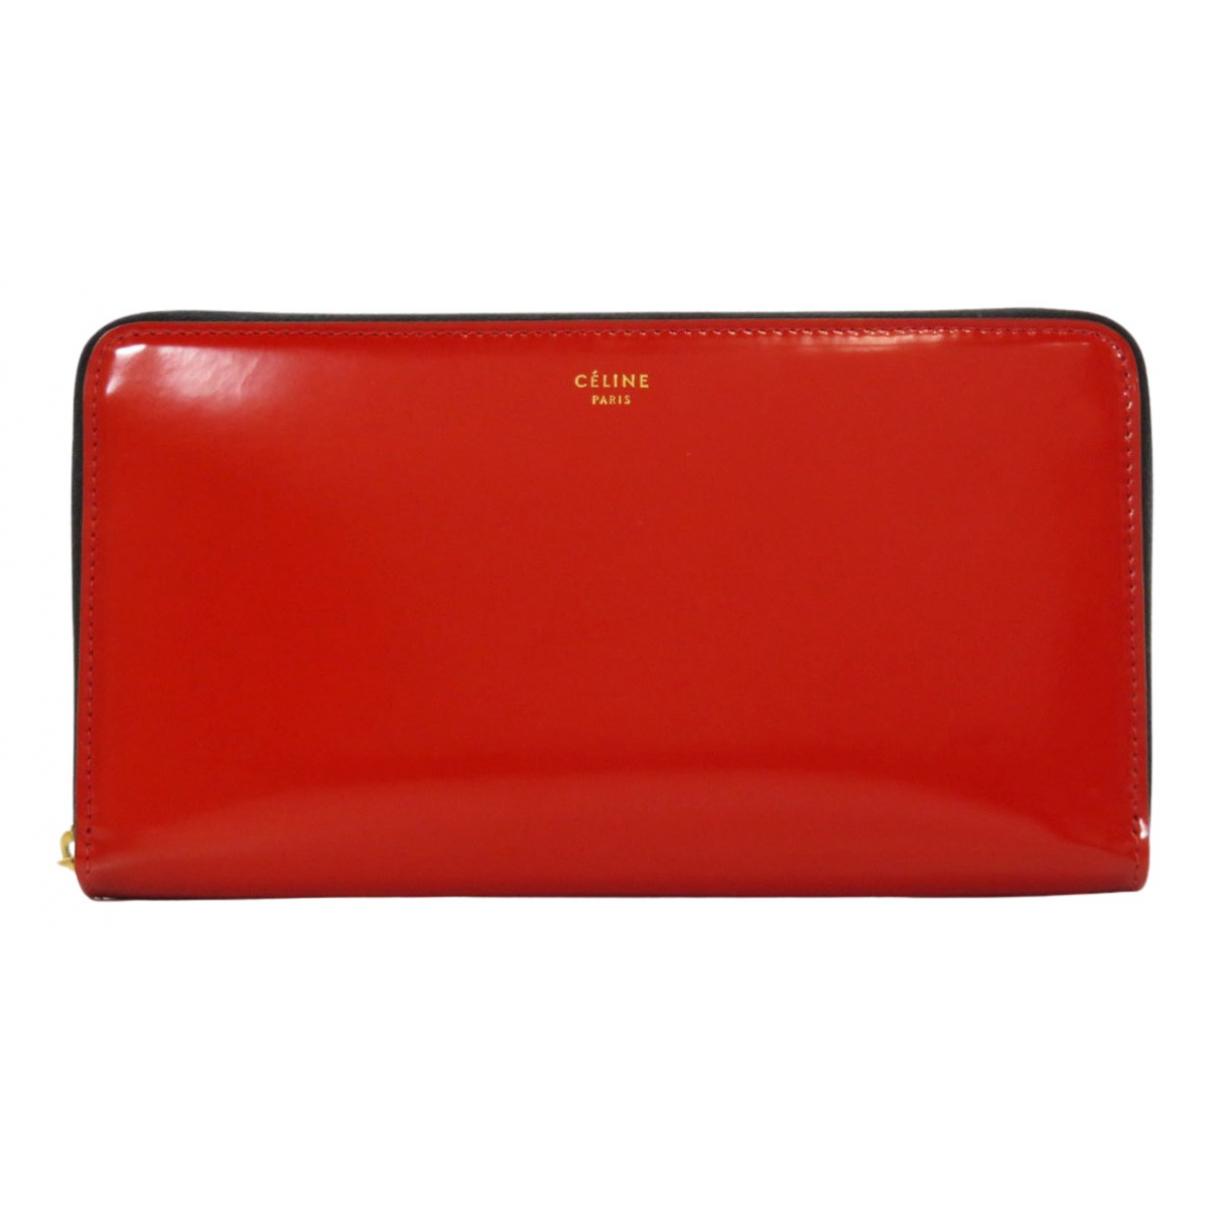 Celine \N Portemonnaie in  Rot Lackleder